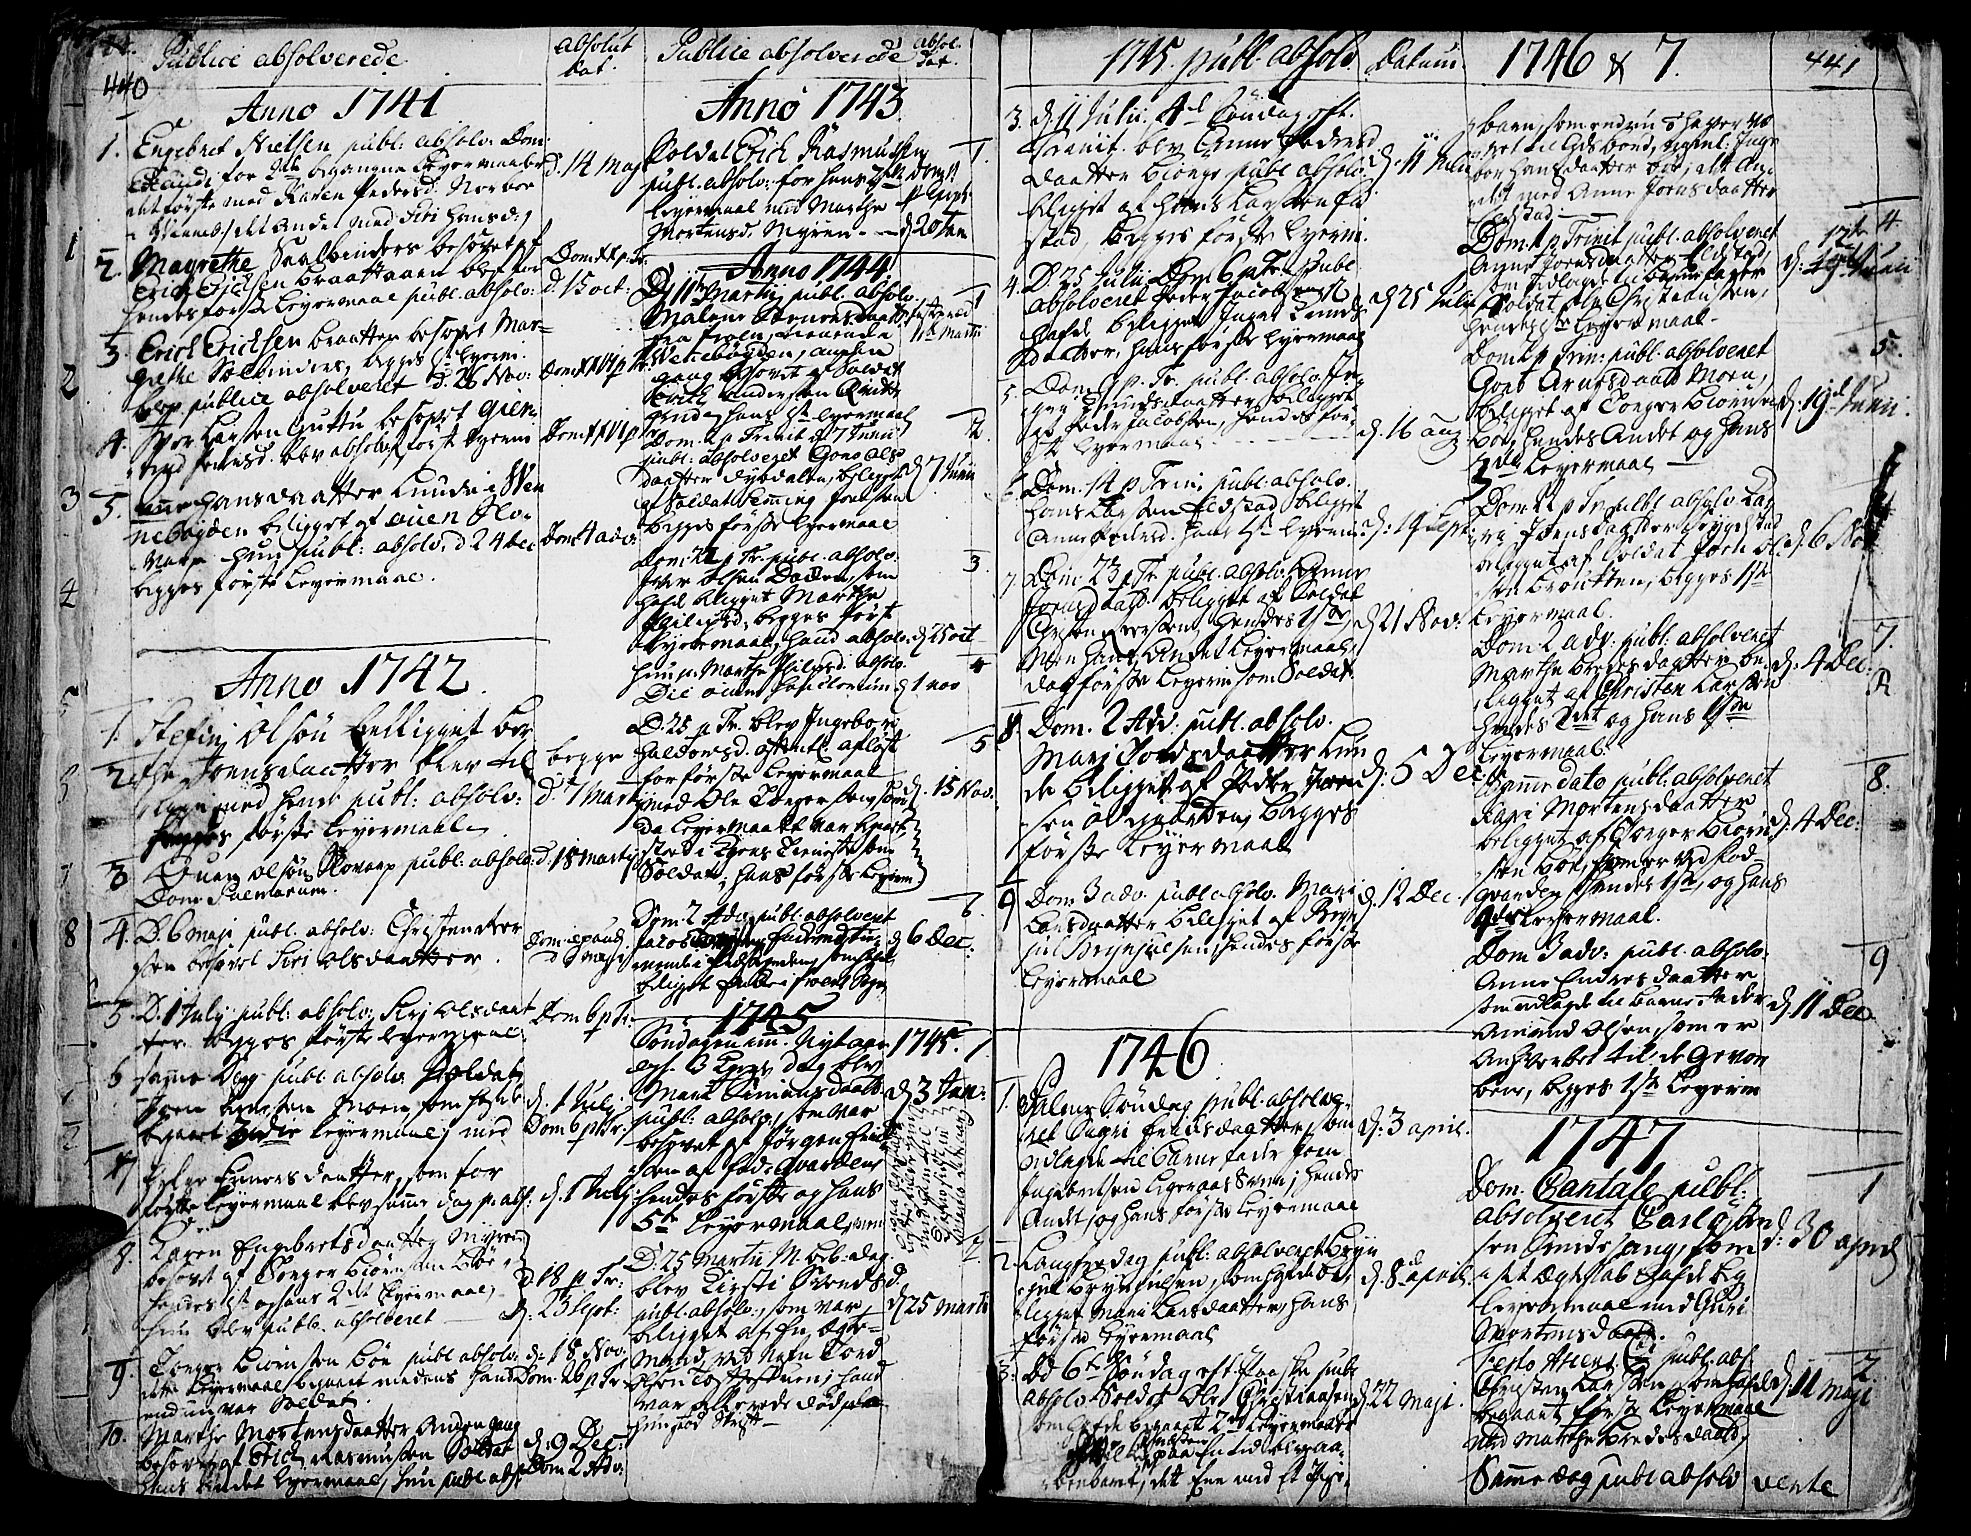 SAH, Ringebu prestekontor, Ministerialbok nr. 2, 1734-1780, s. 440-441